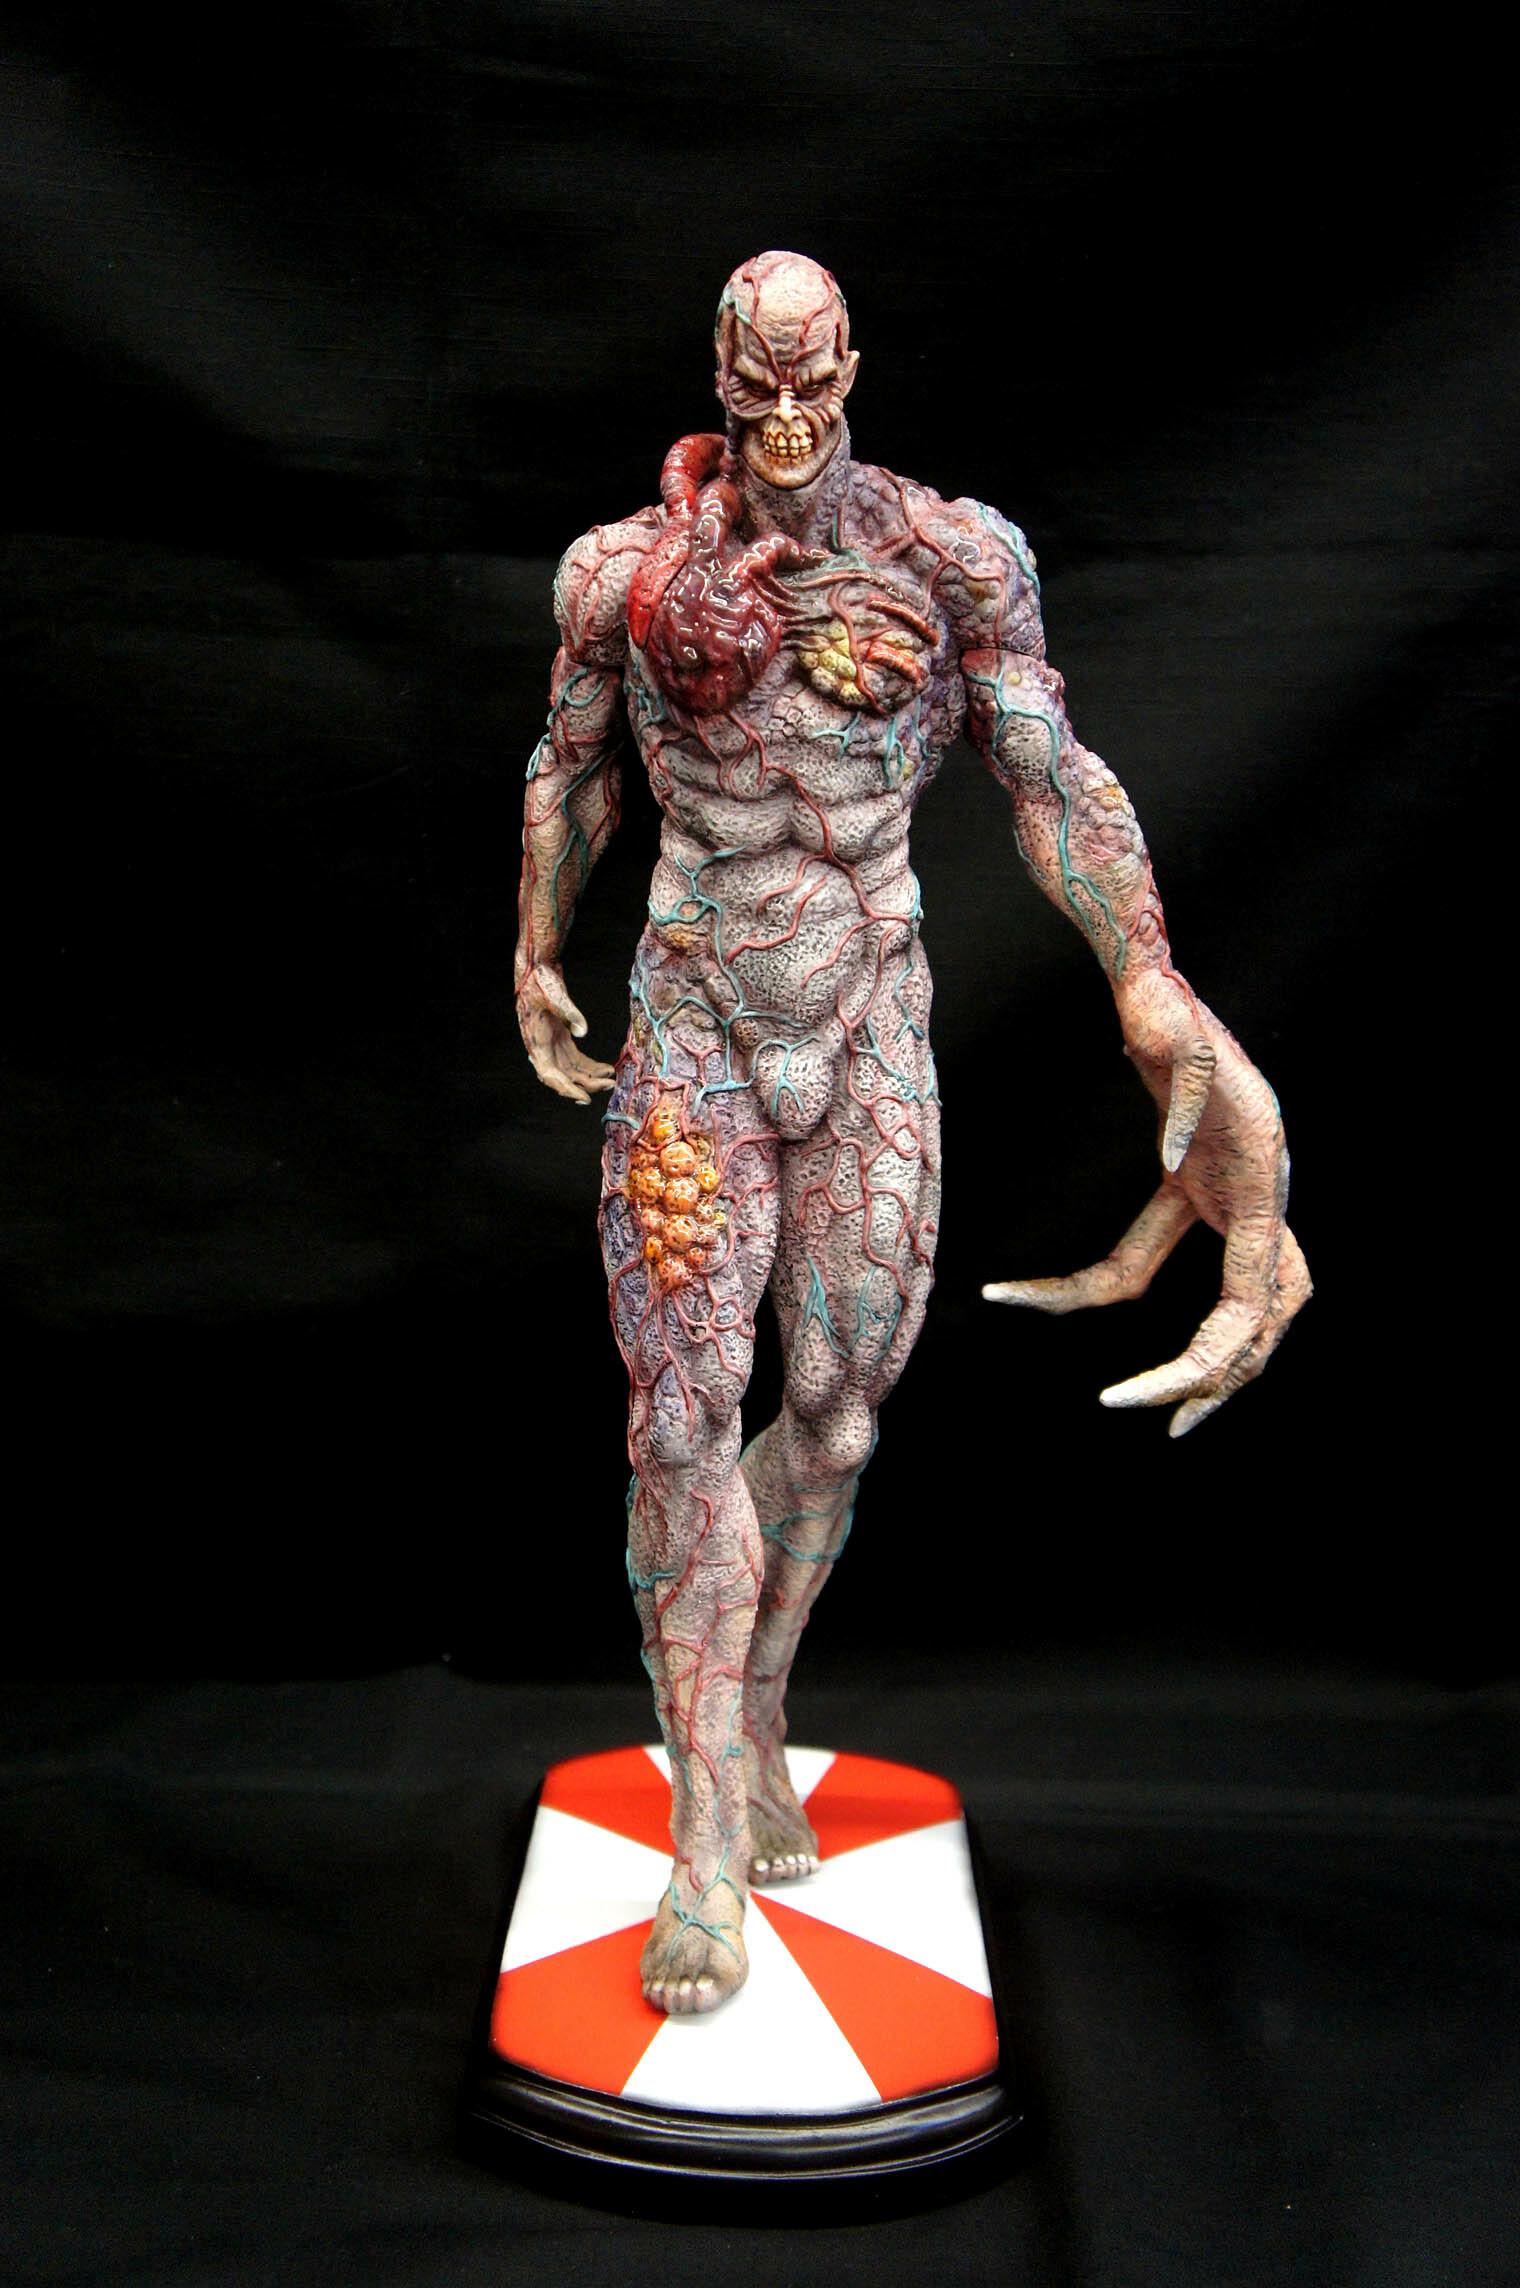 Biohazard (Resident Evil) Tyrant Art Statue